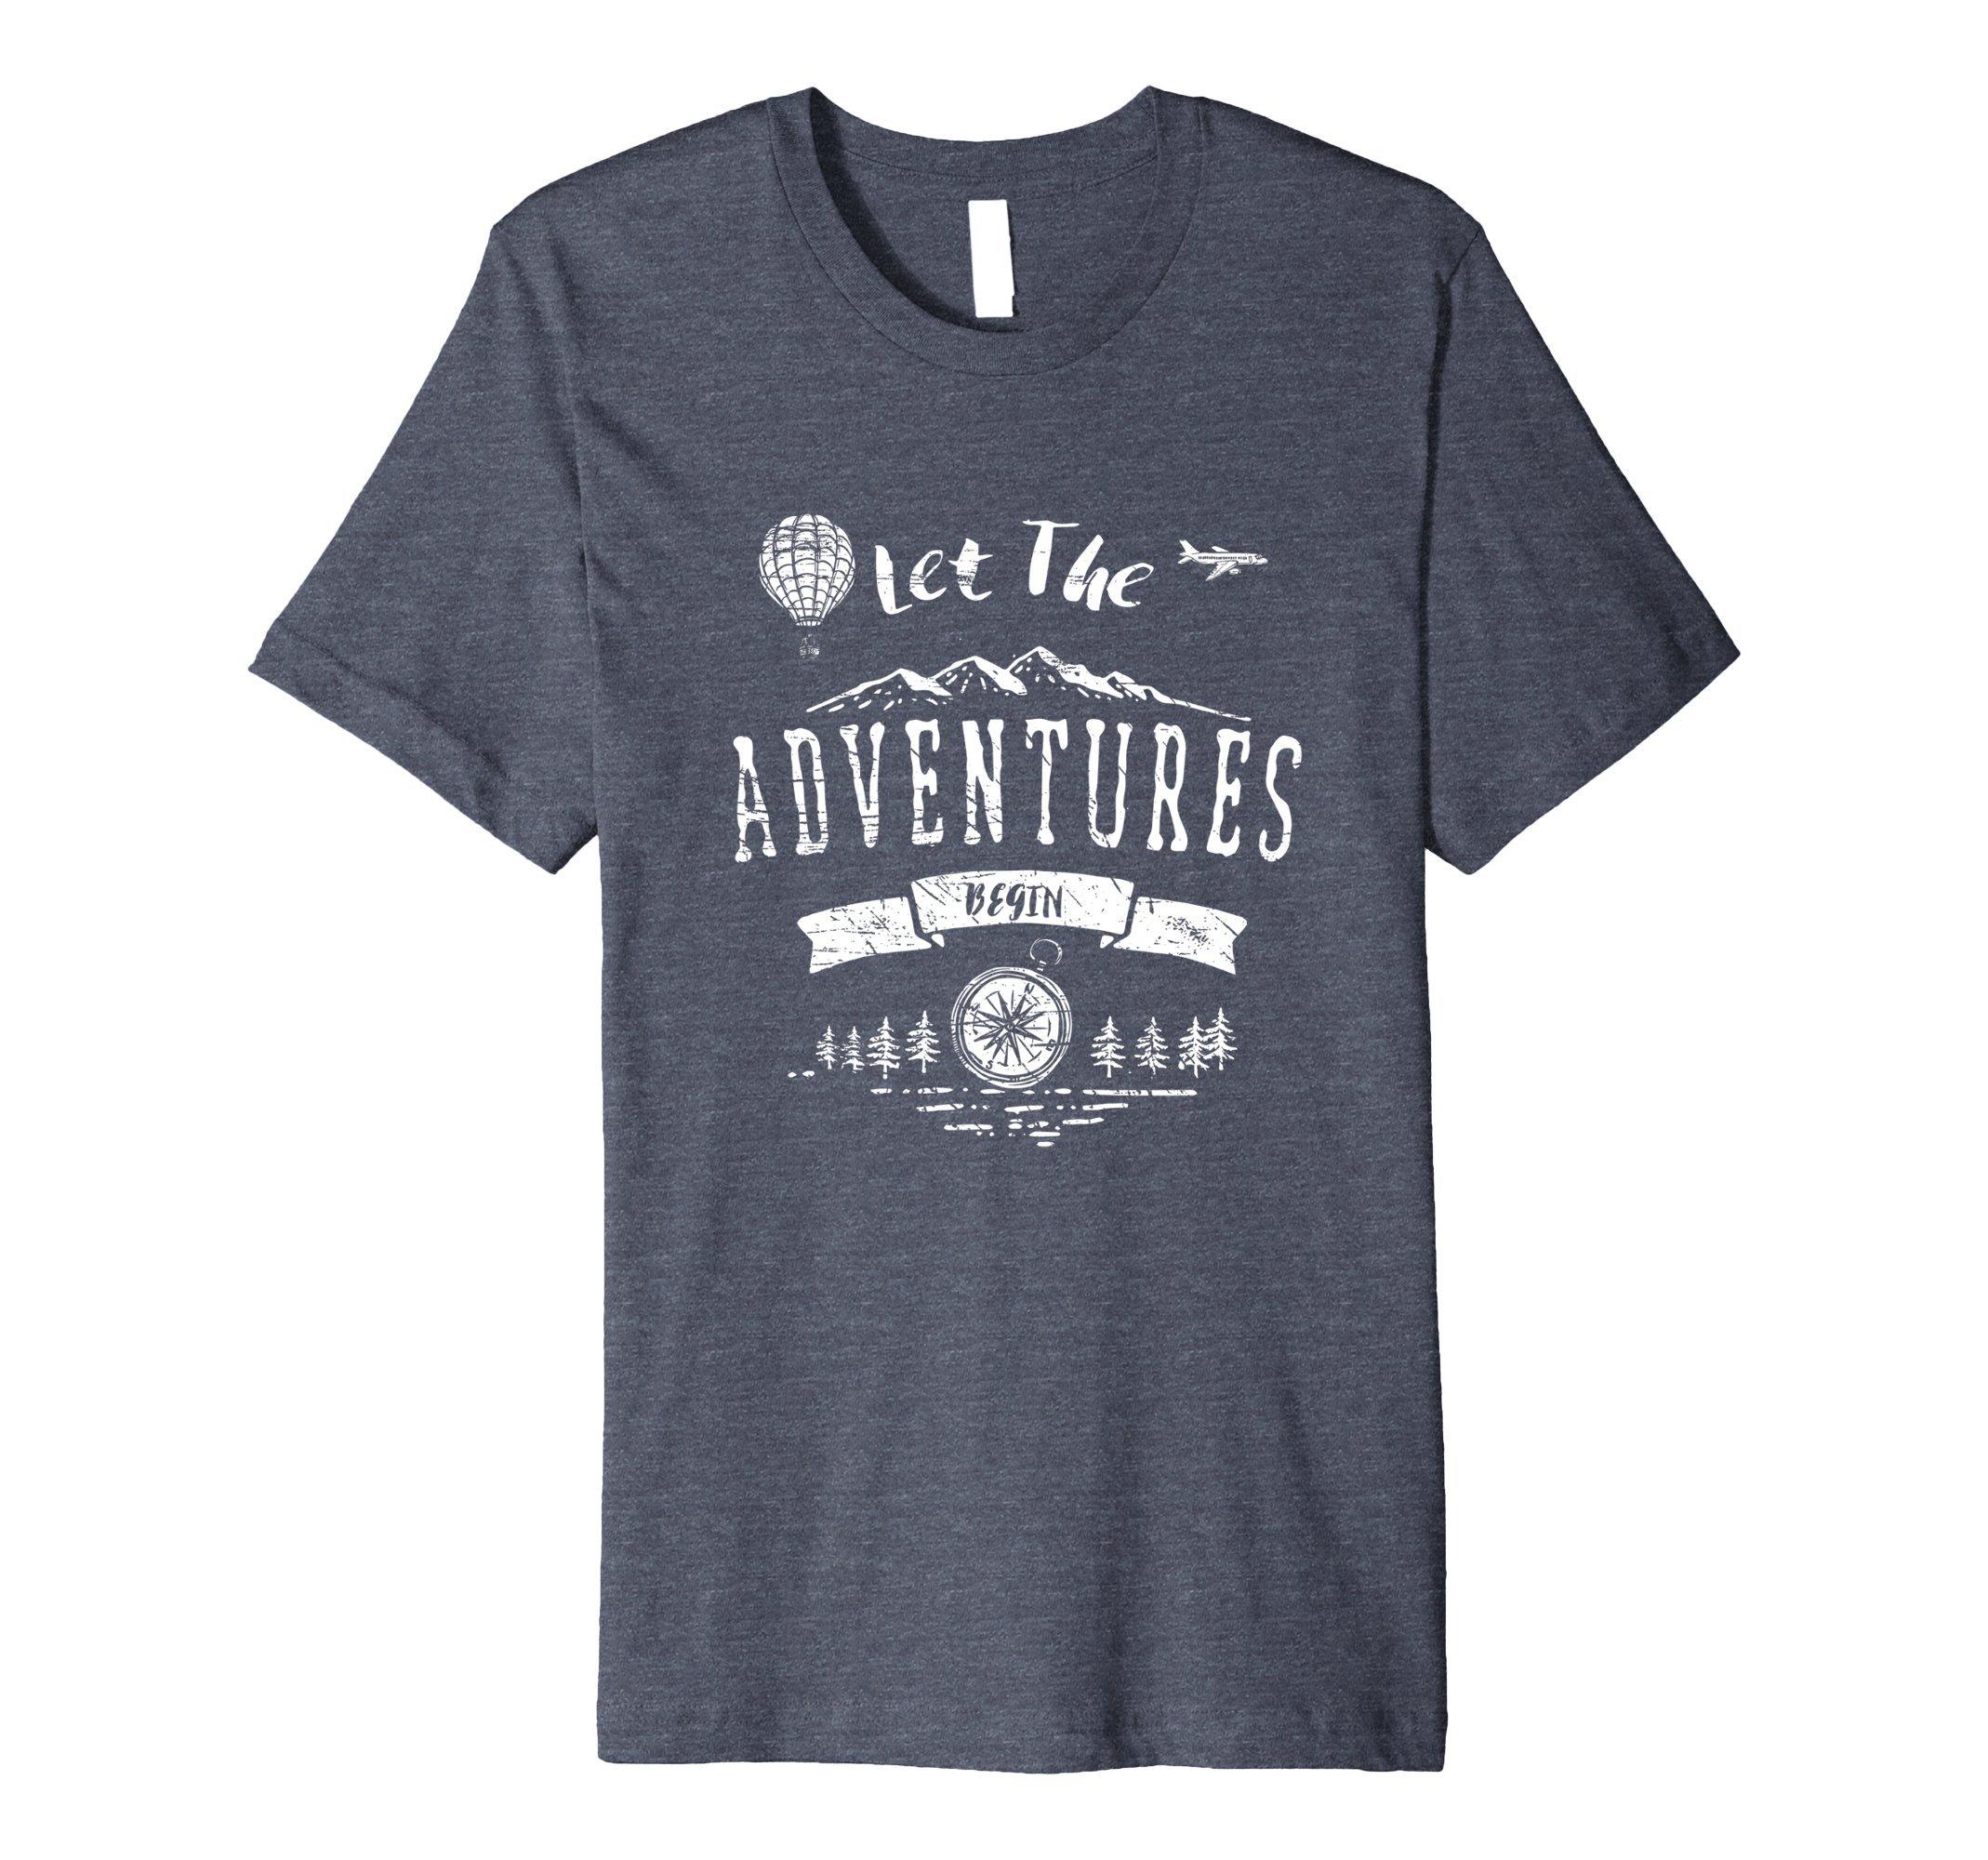 Mens Let The Adventures Begin T-Shirt Travel Explore Apparel 2XL Heather Blue